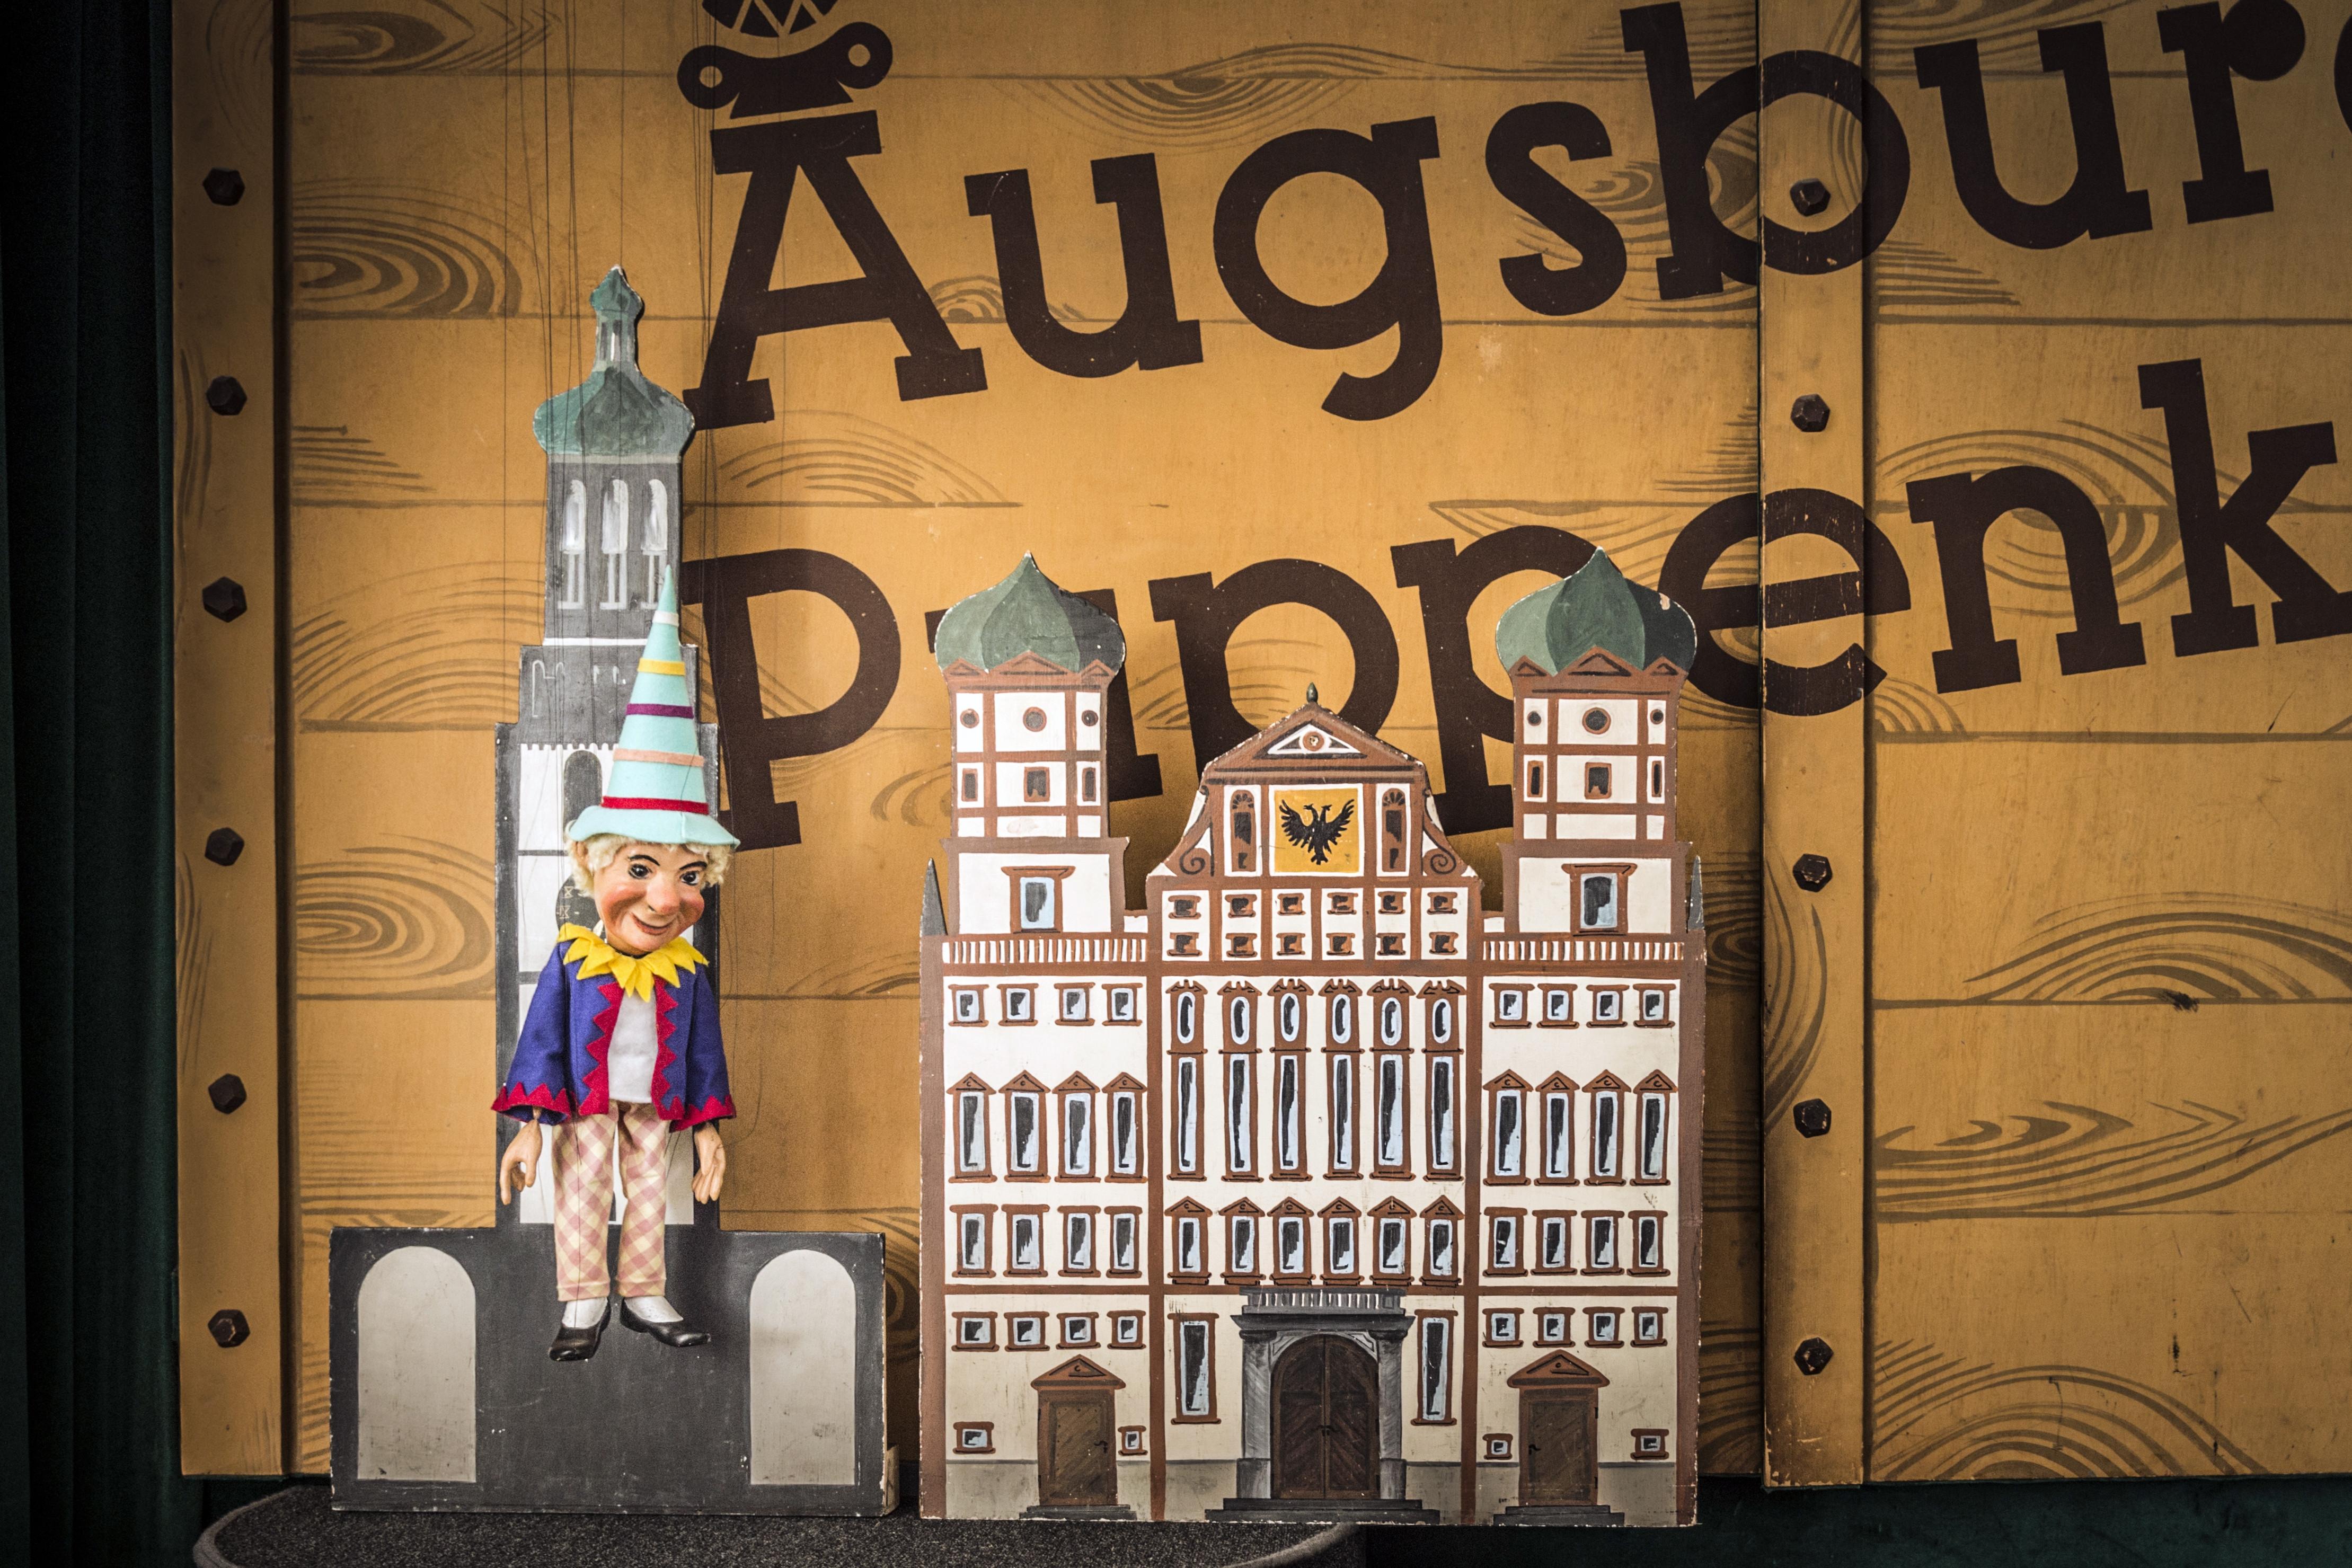 Jim Knopf Ausmalbild Inspirierend Ausmalbilder Jim Knopf Luxus Augsburger Puppenkiste Urmel & Co Bild